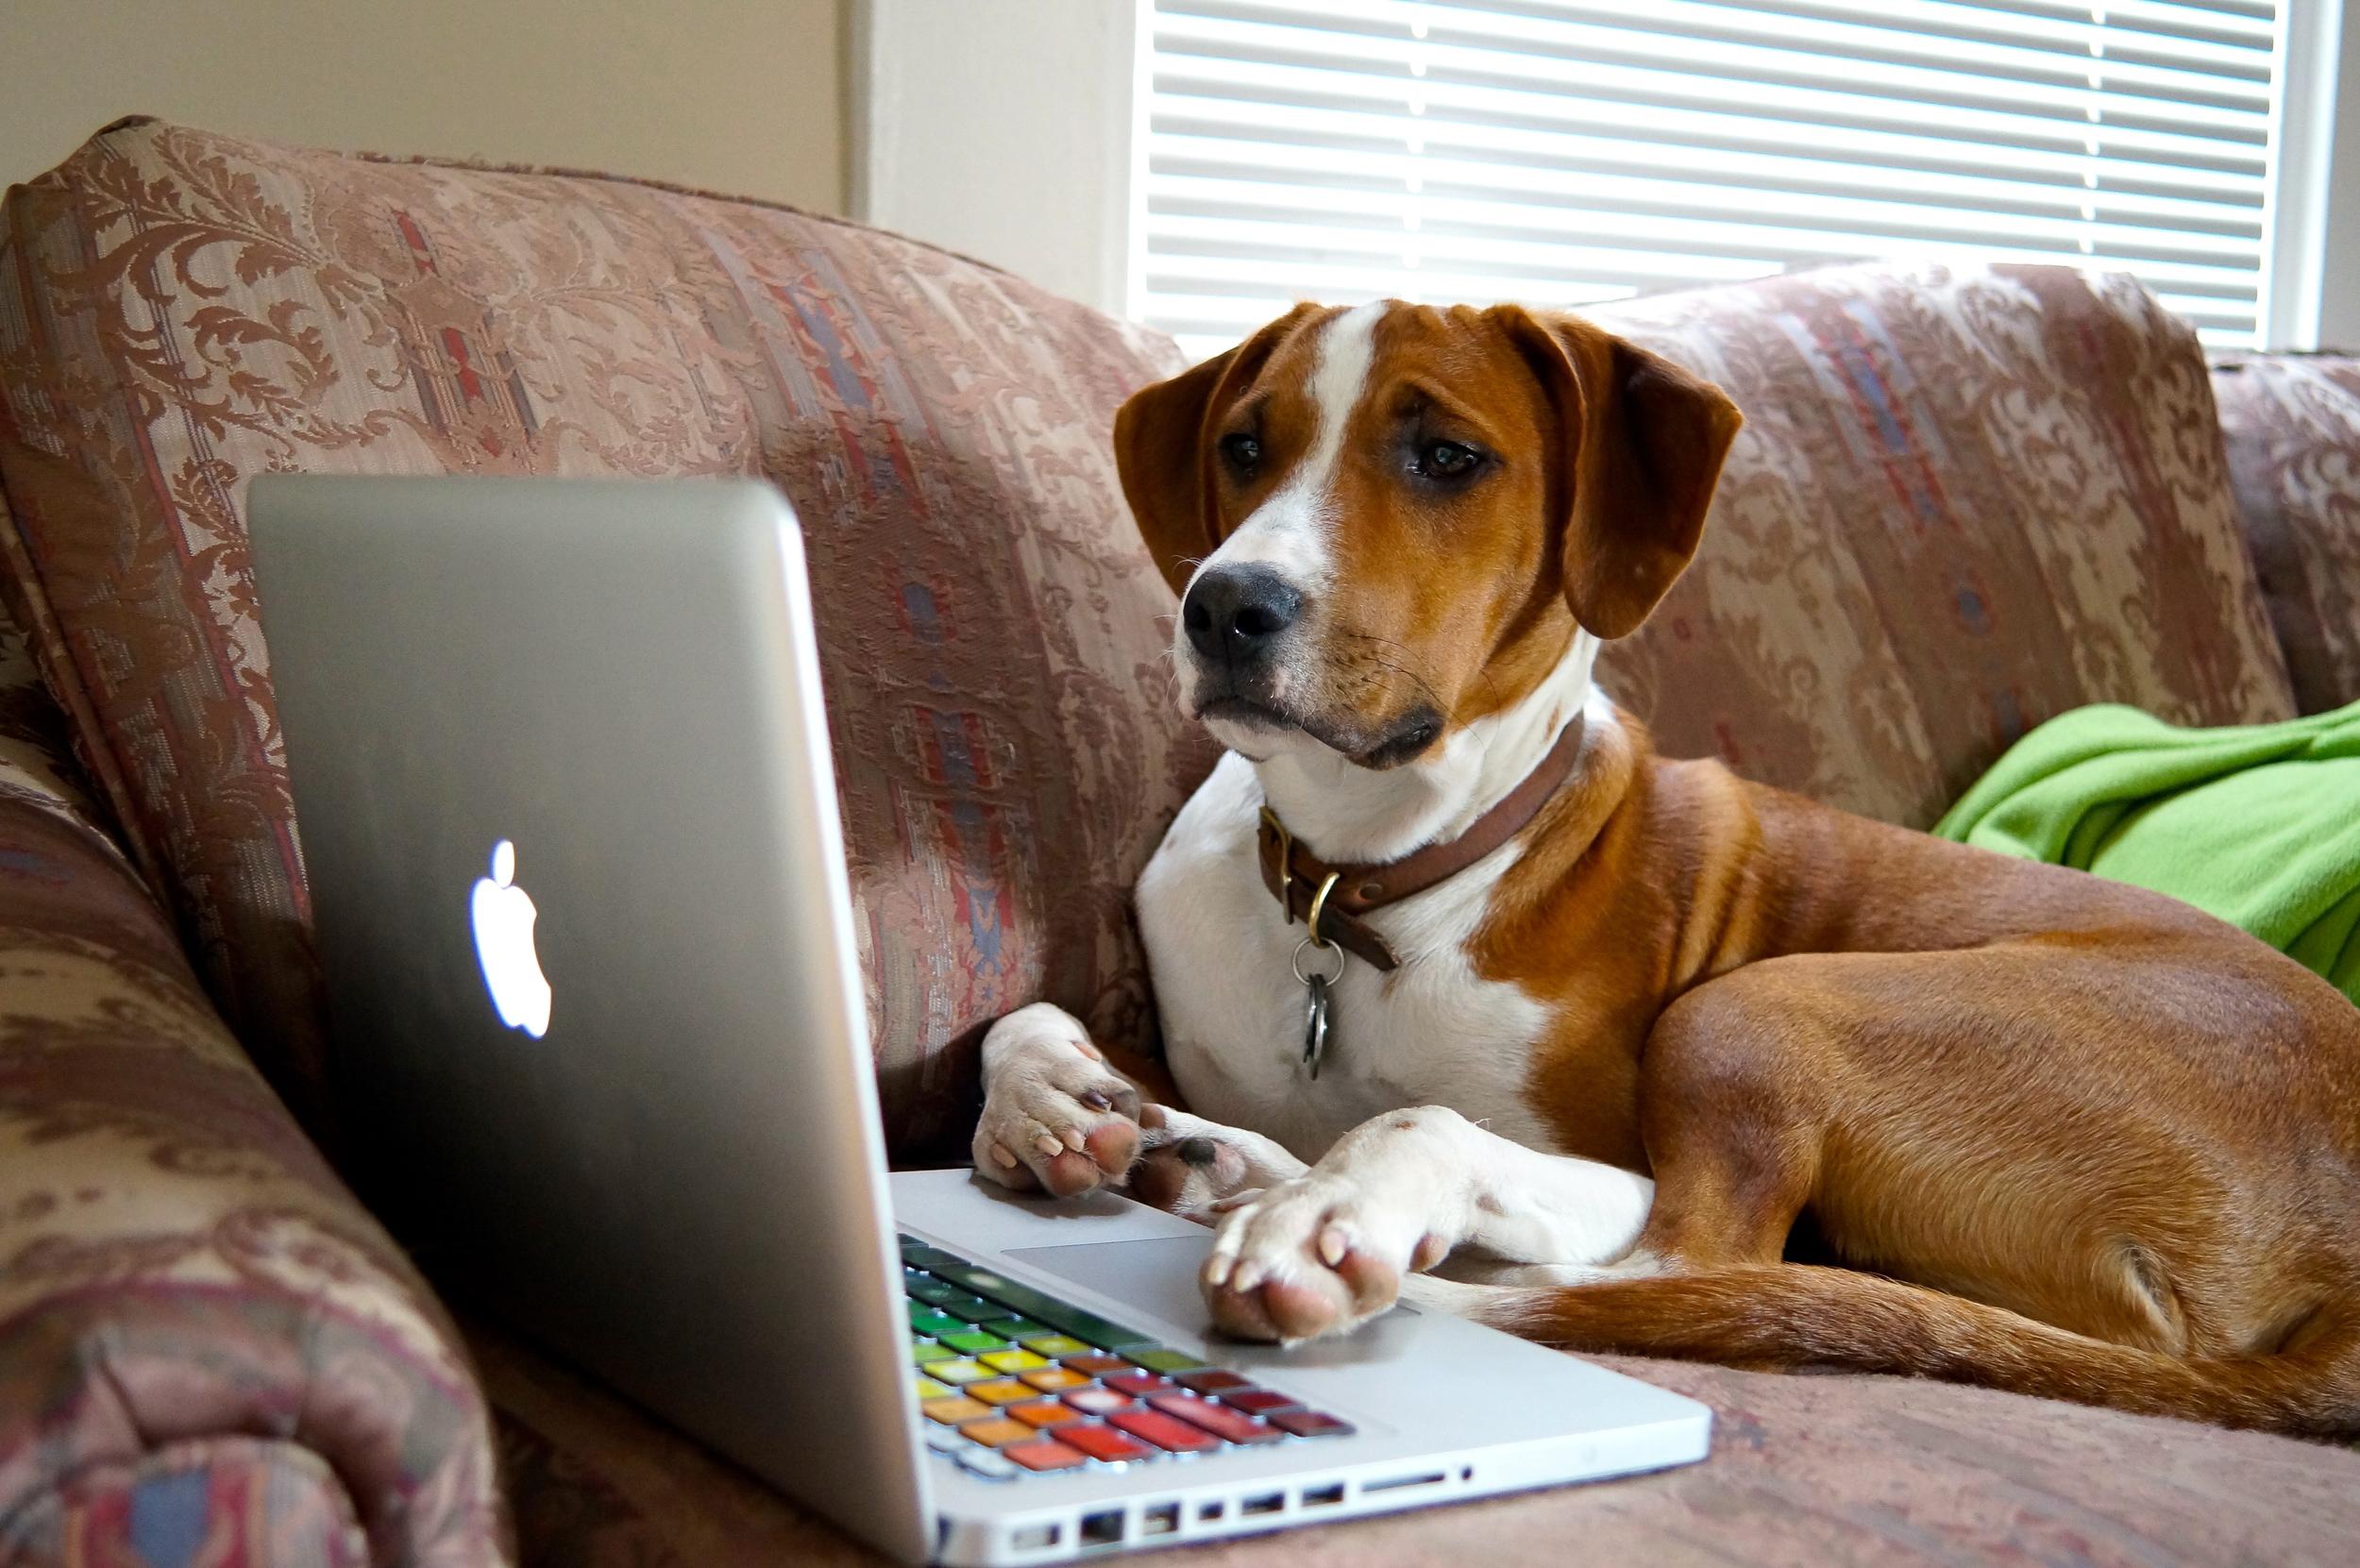 dog computer.jpg